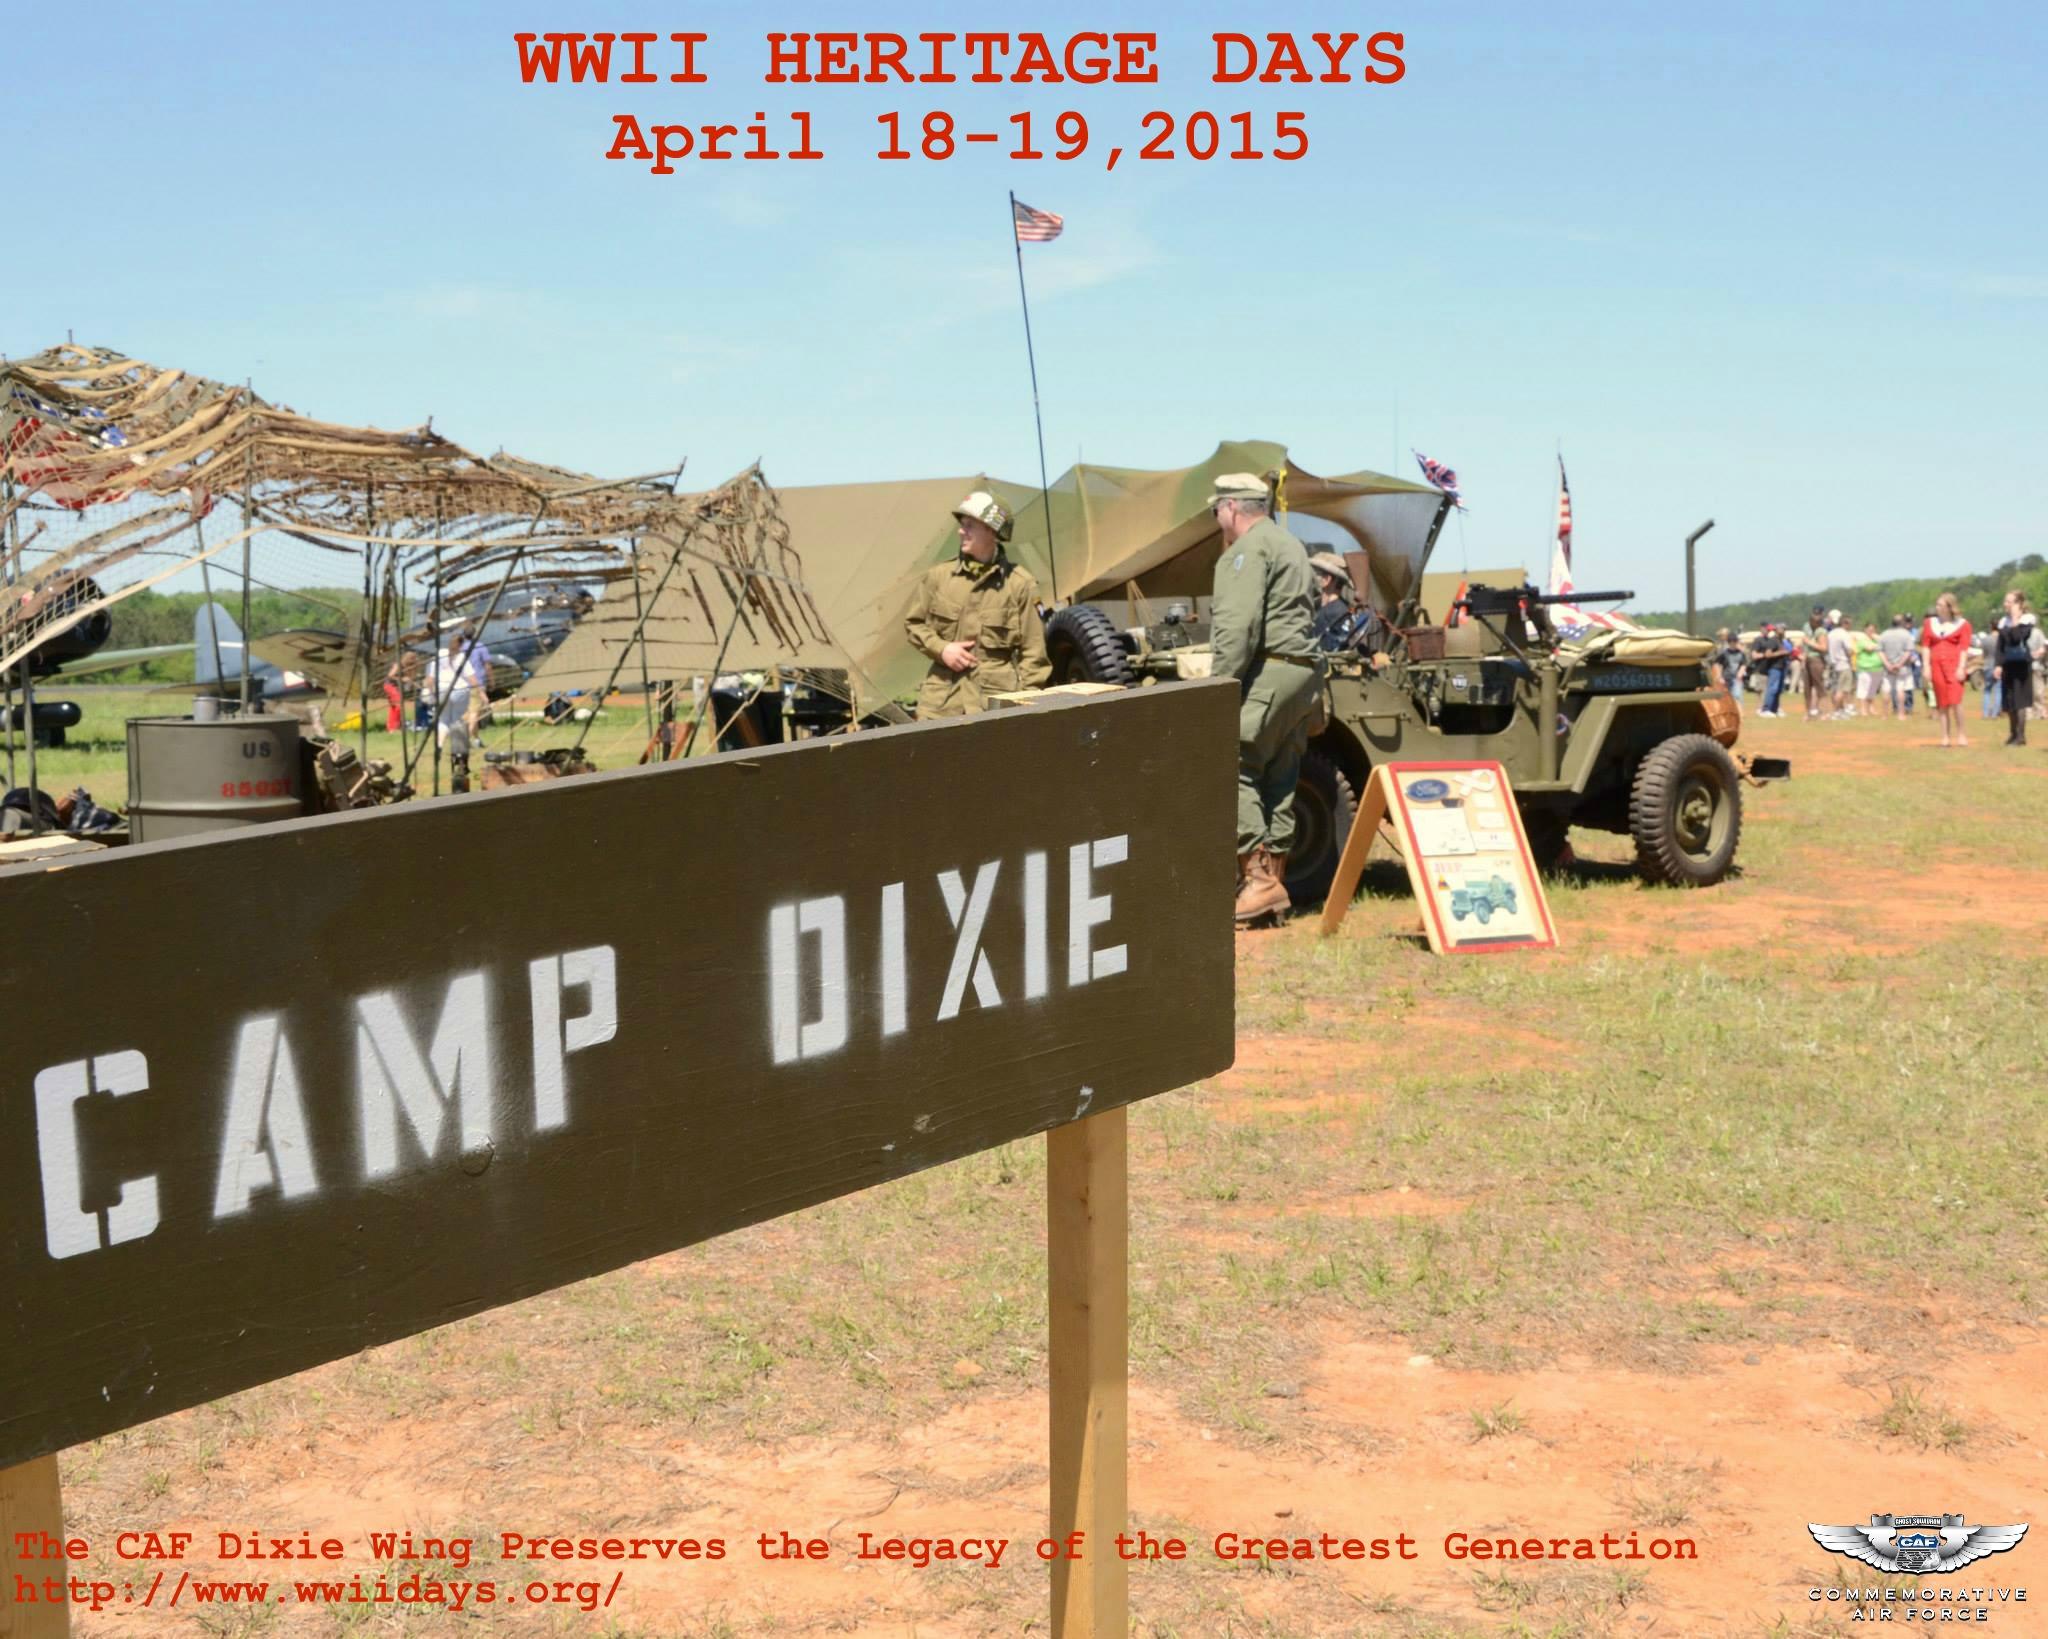 WWII Heritage Days